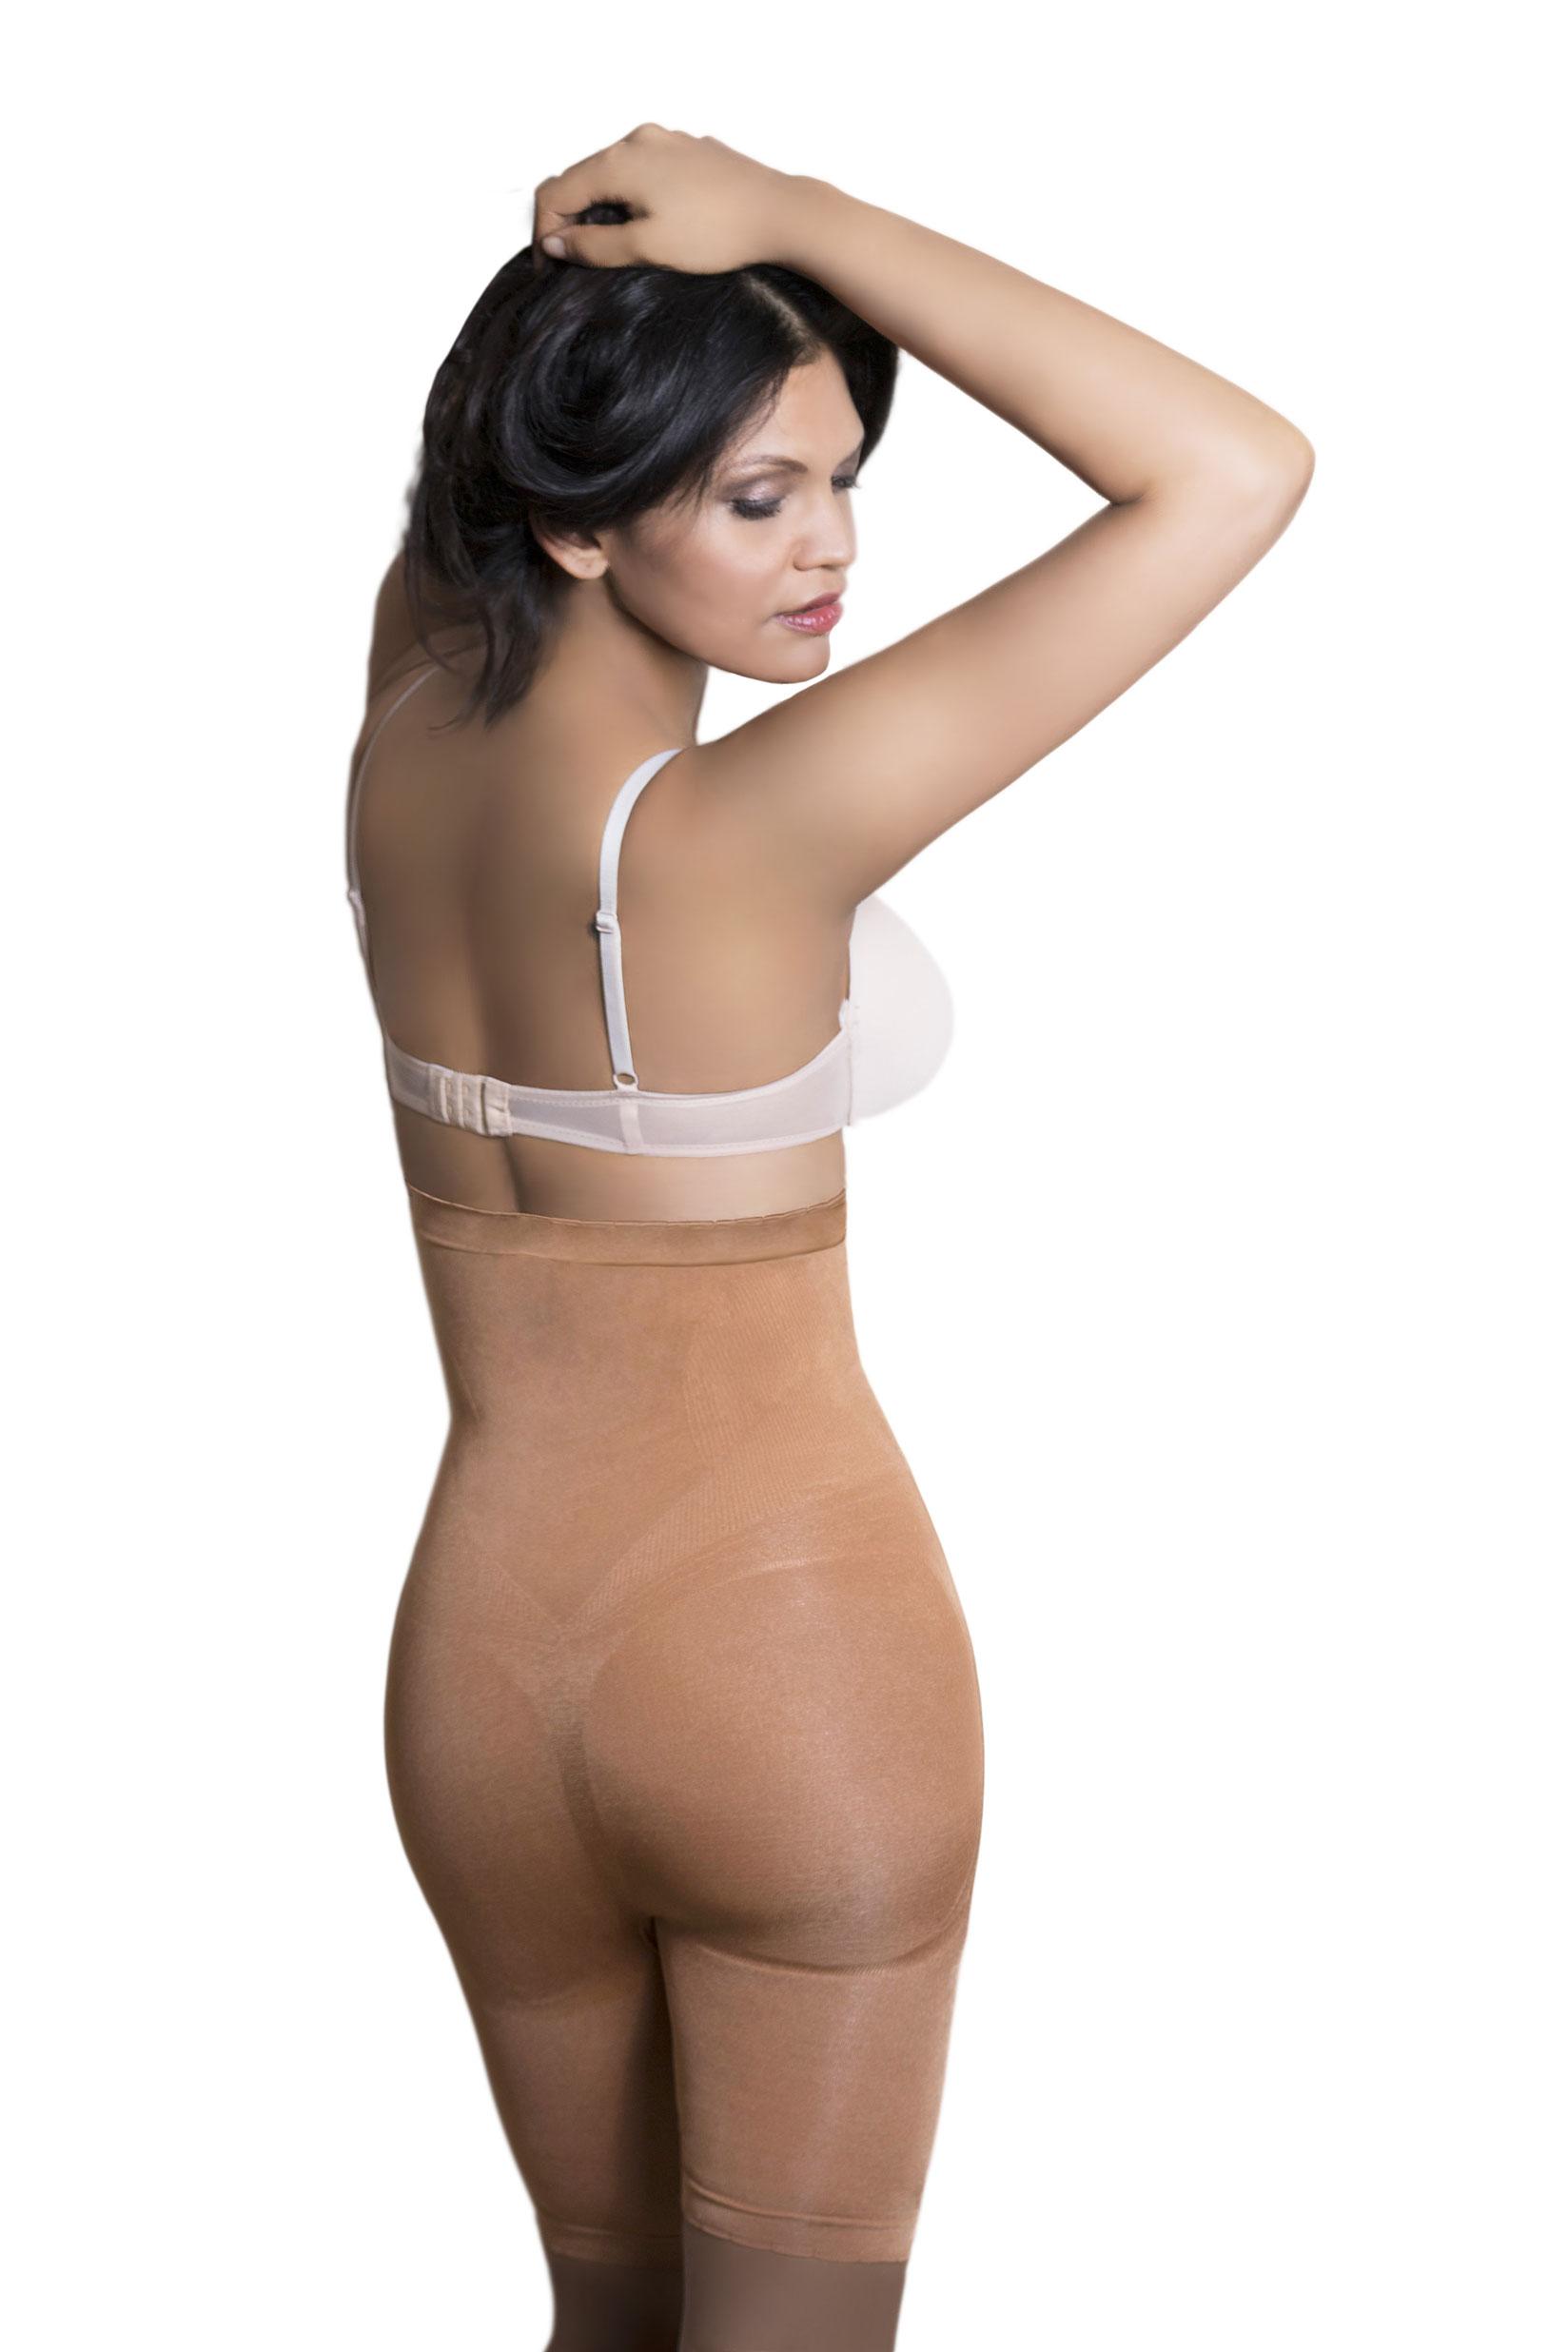 b101b2427ad0 Multi Pack Essential Slimming Shorts Intimate Shapewear Lingerie High Waist  Long Leg Pants Black Nude Brown on Storenvy